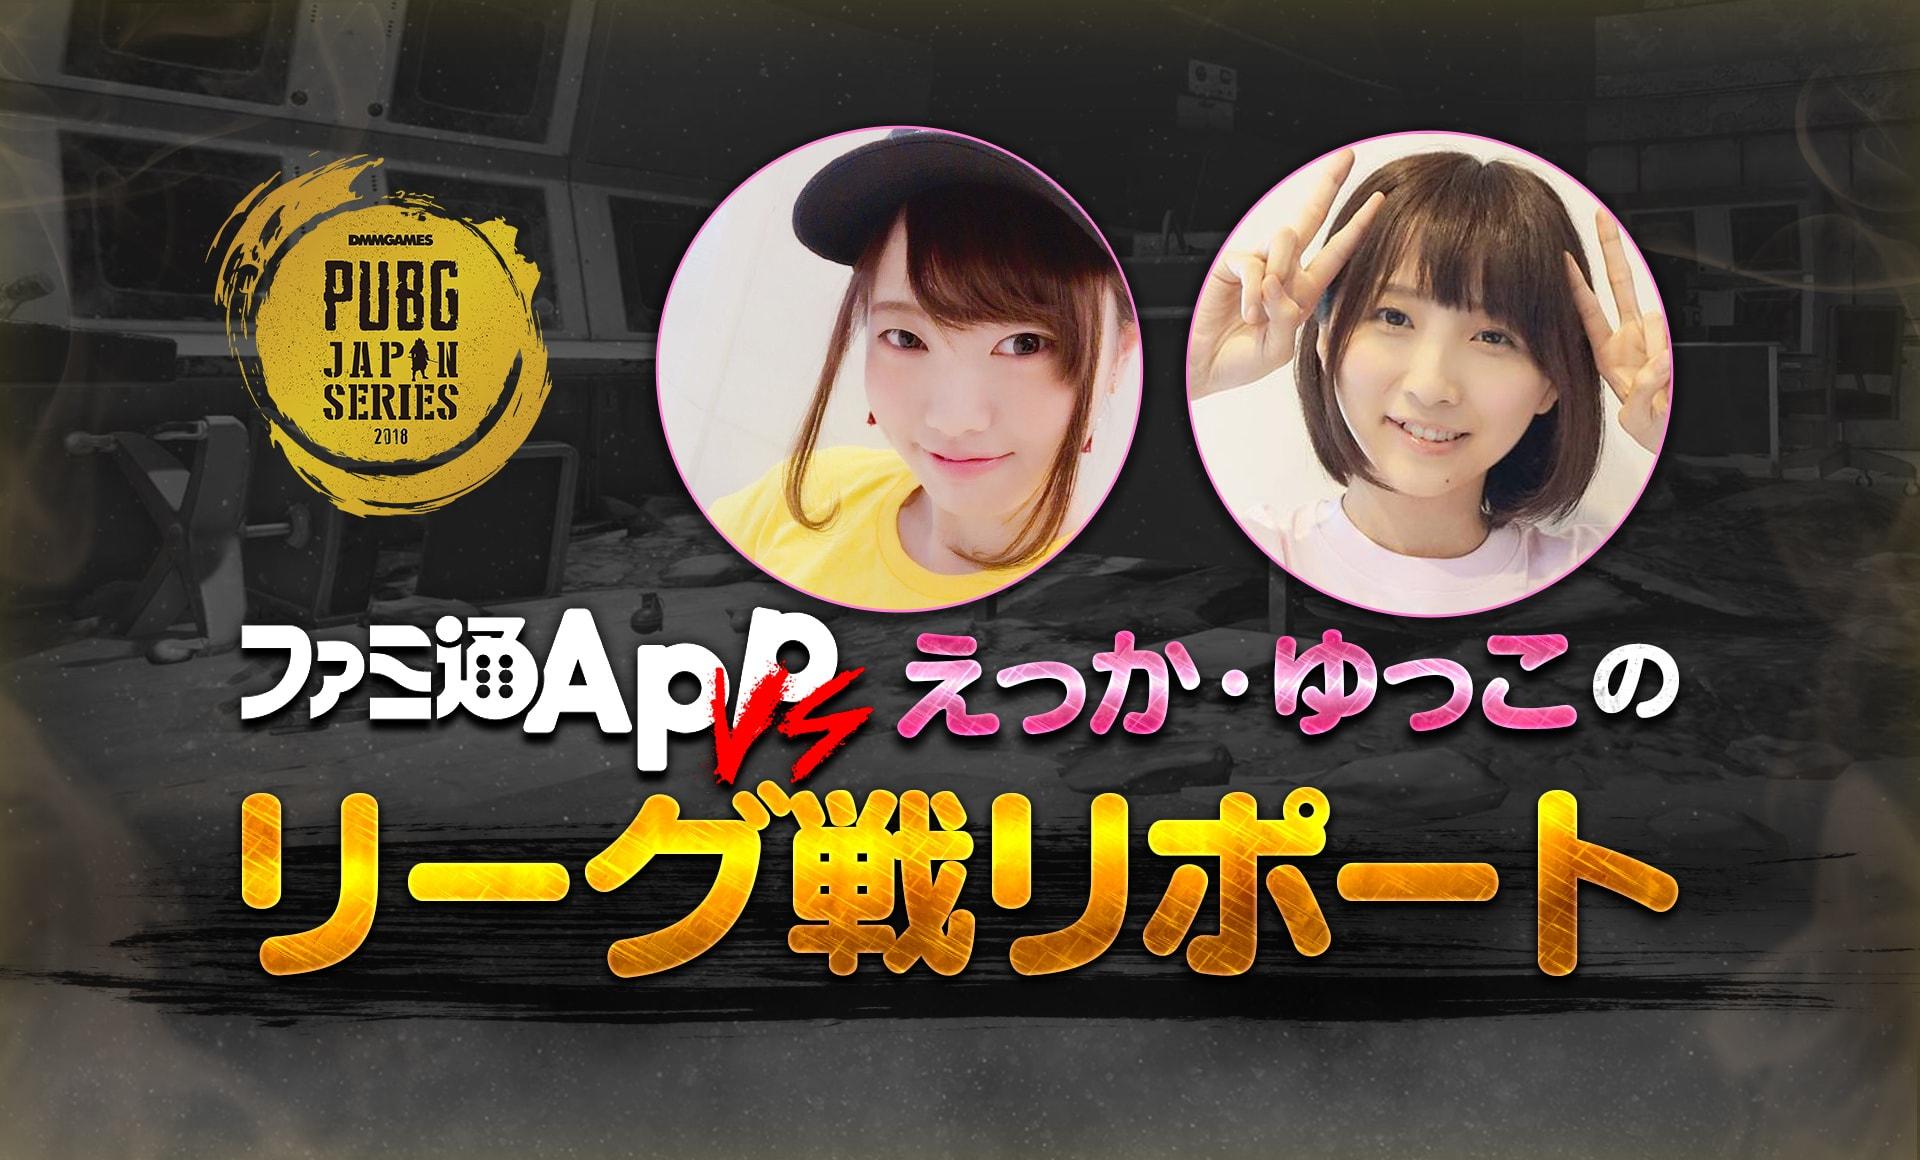 PUBG JAPAN SERIES αリーグ ファミ通App VS レポート